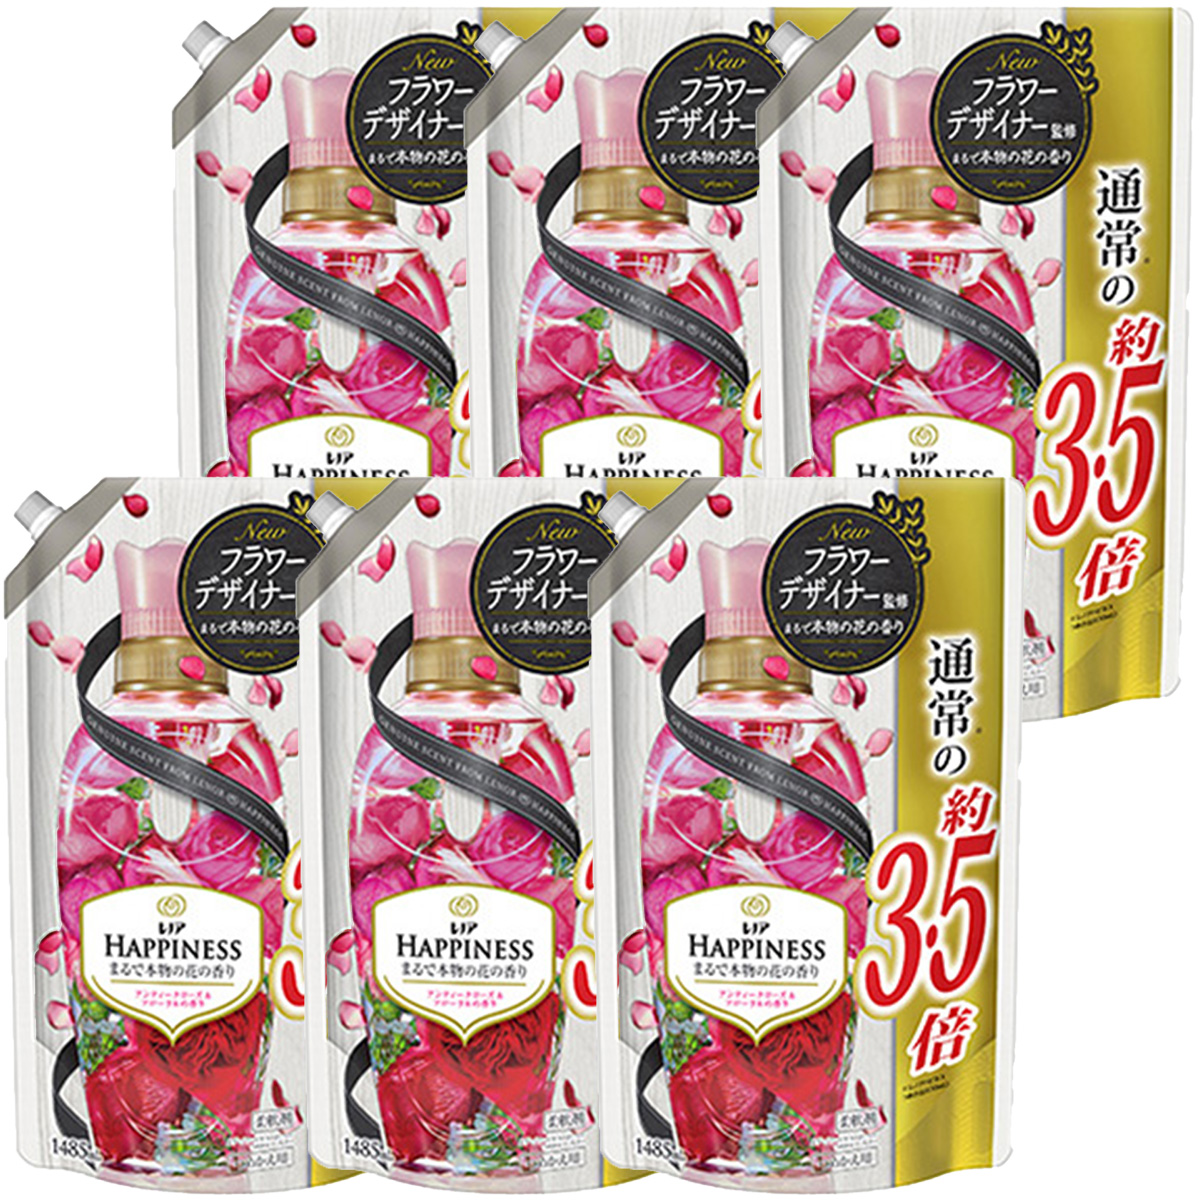 P&G レノアハピネス 柔軟剤 アンティークローズ&フローラル つめかえ 超特大 1485mL×6袋